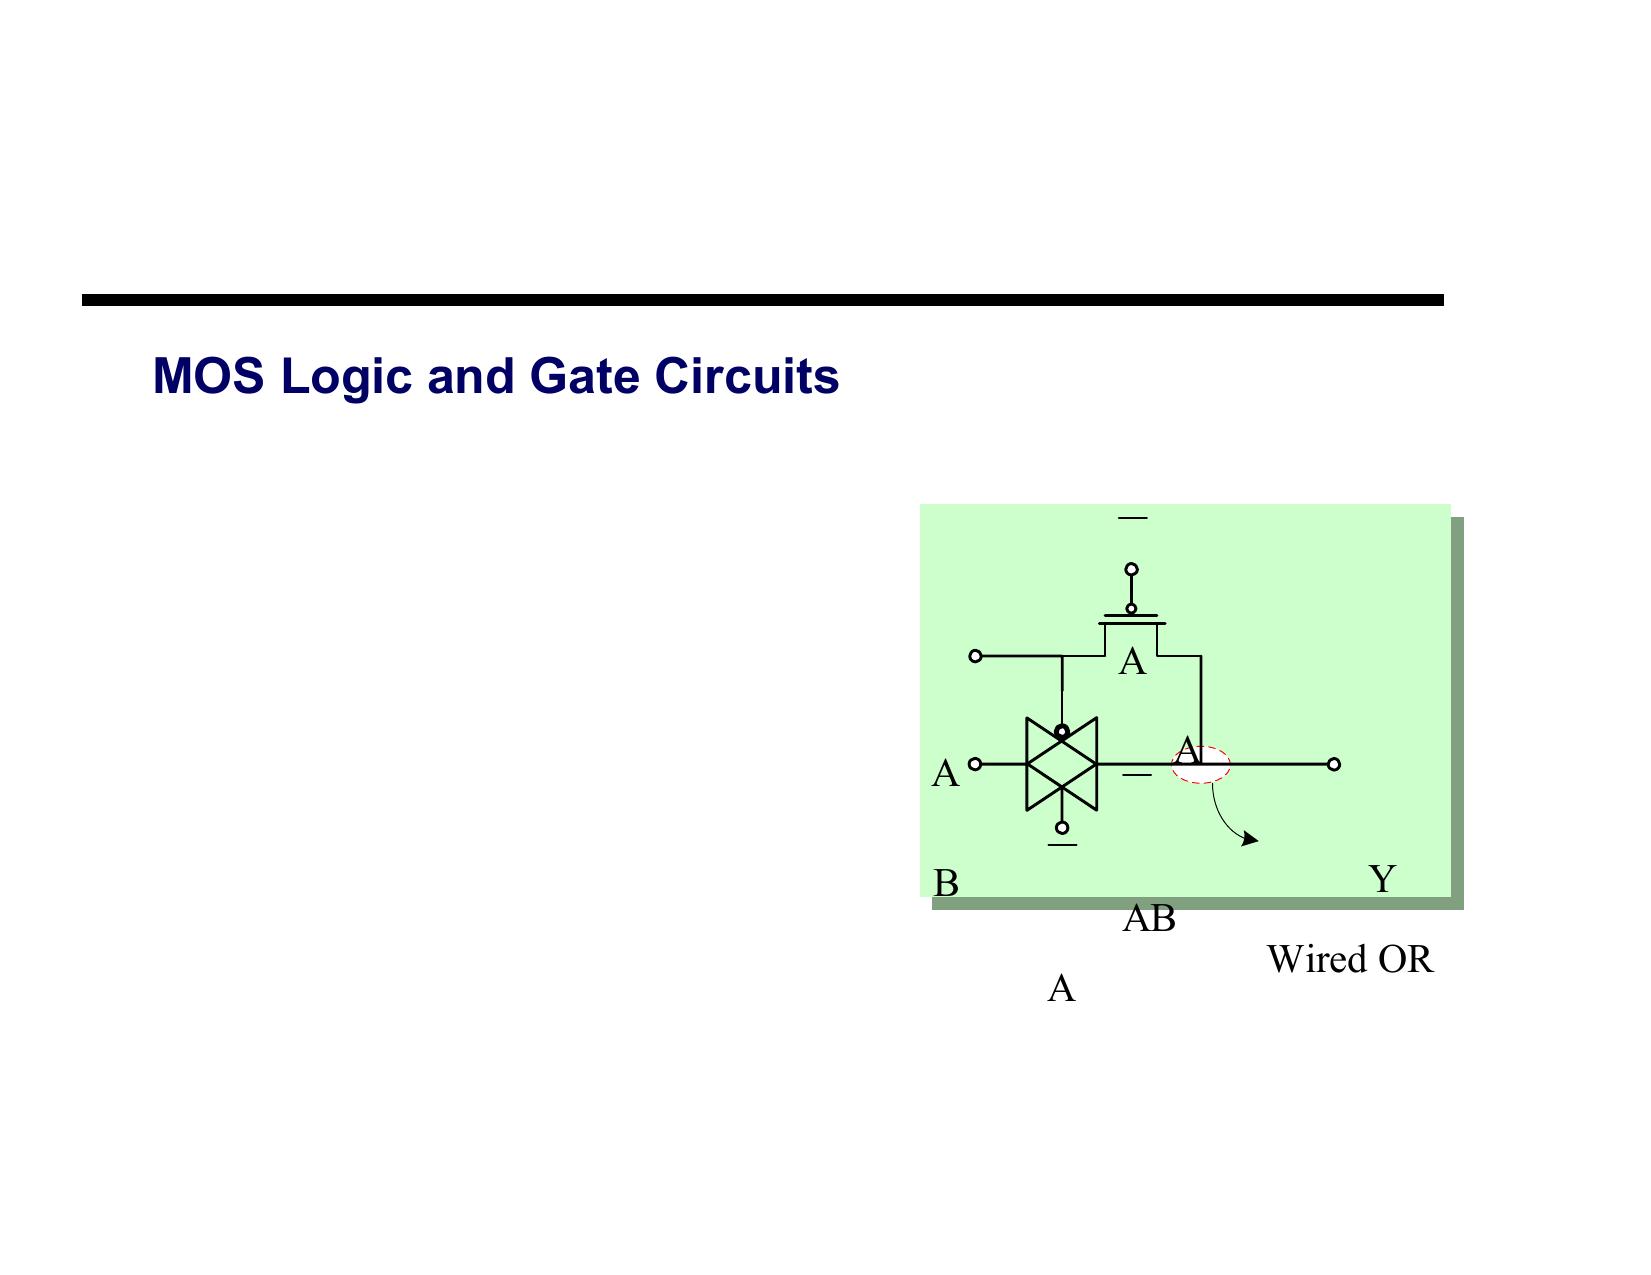 Nmos Nand Gate Circuit Diagram Mos Logic And Circuits 1024x791